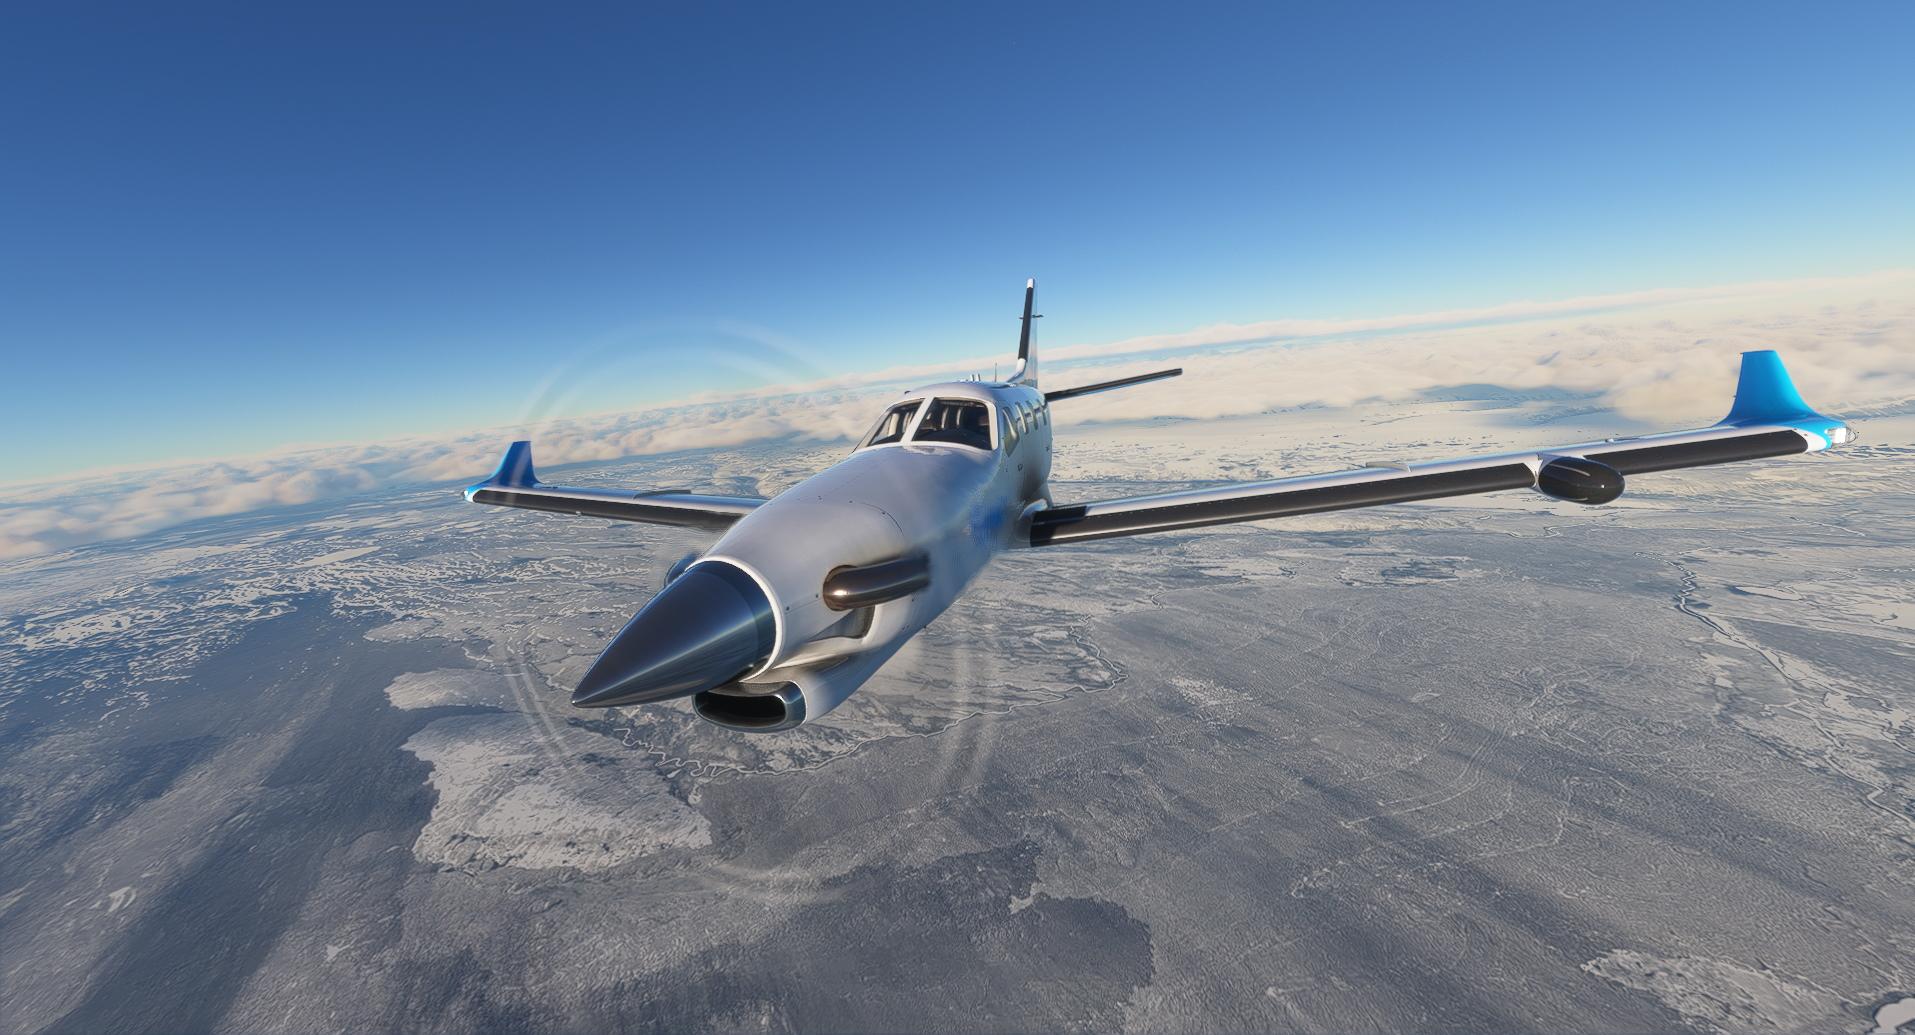 Tbm 930 Over Iceland